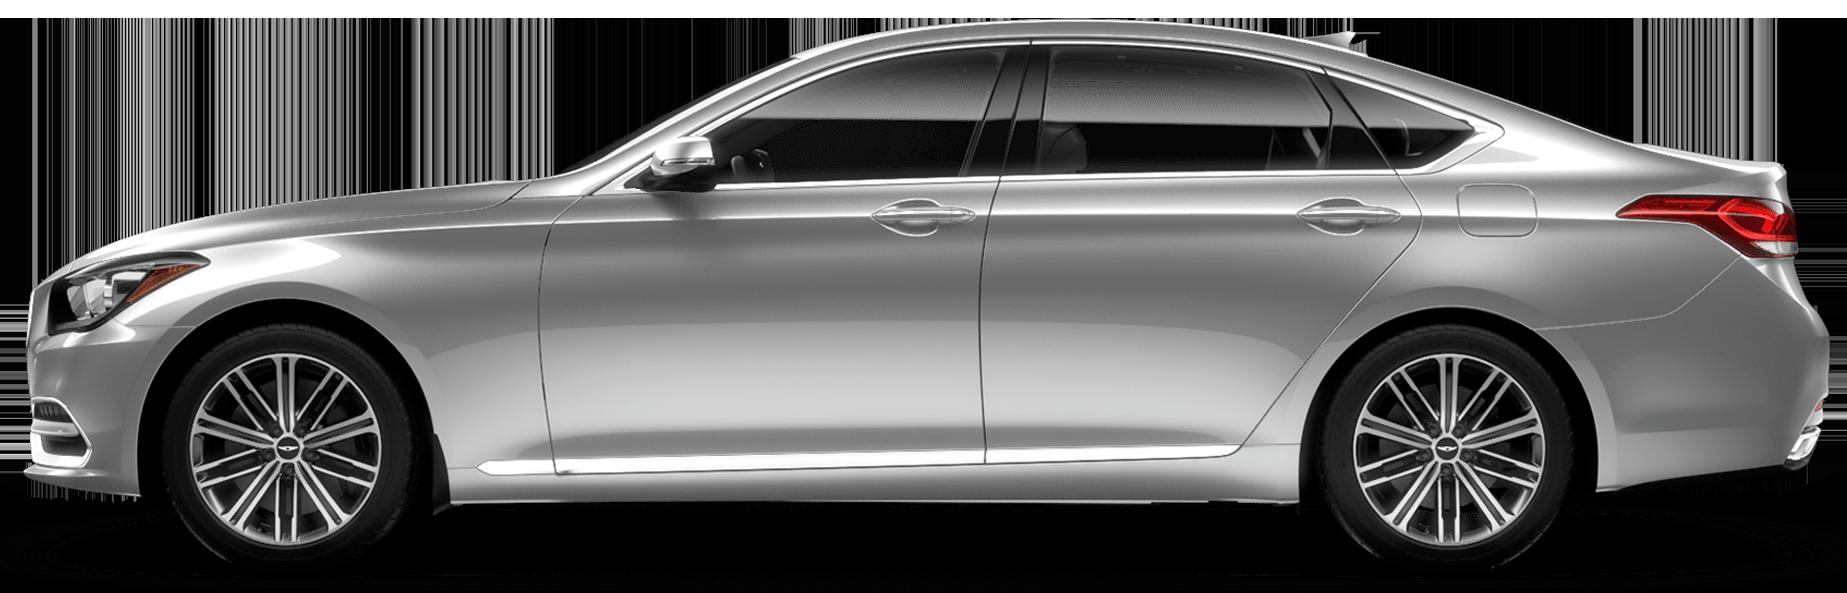 2019 Genesis G80 Sedan 3.8